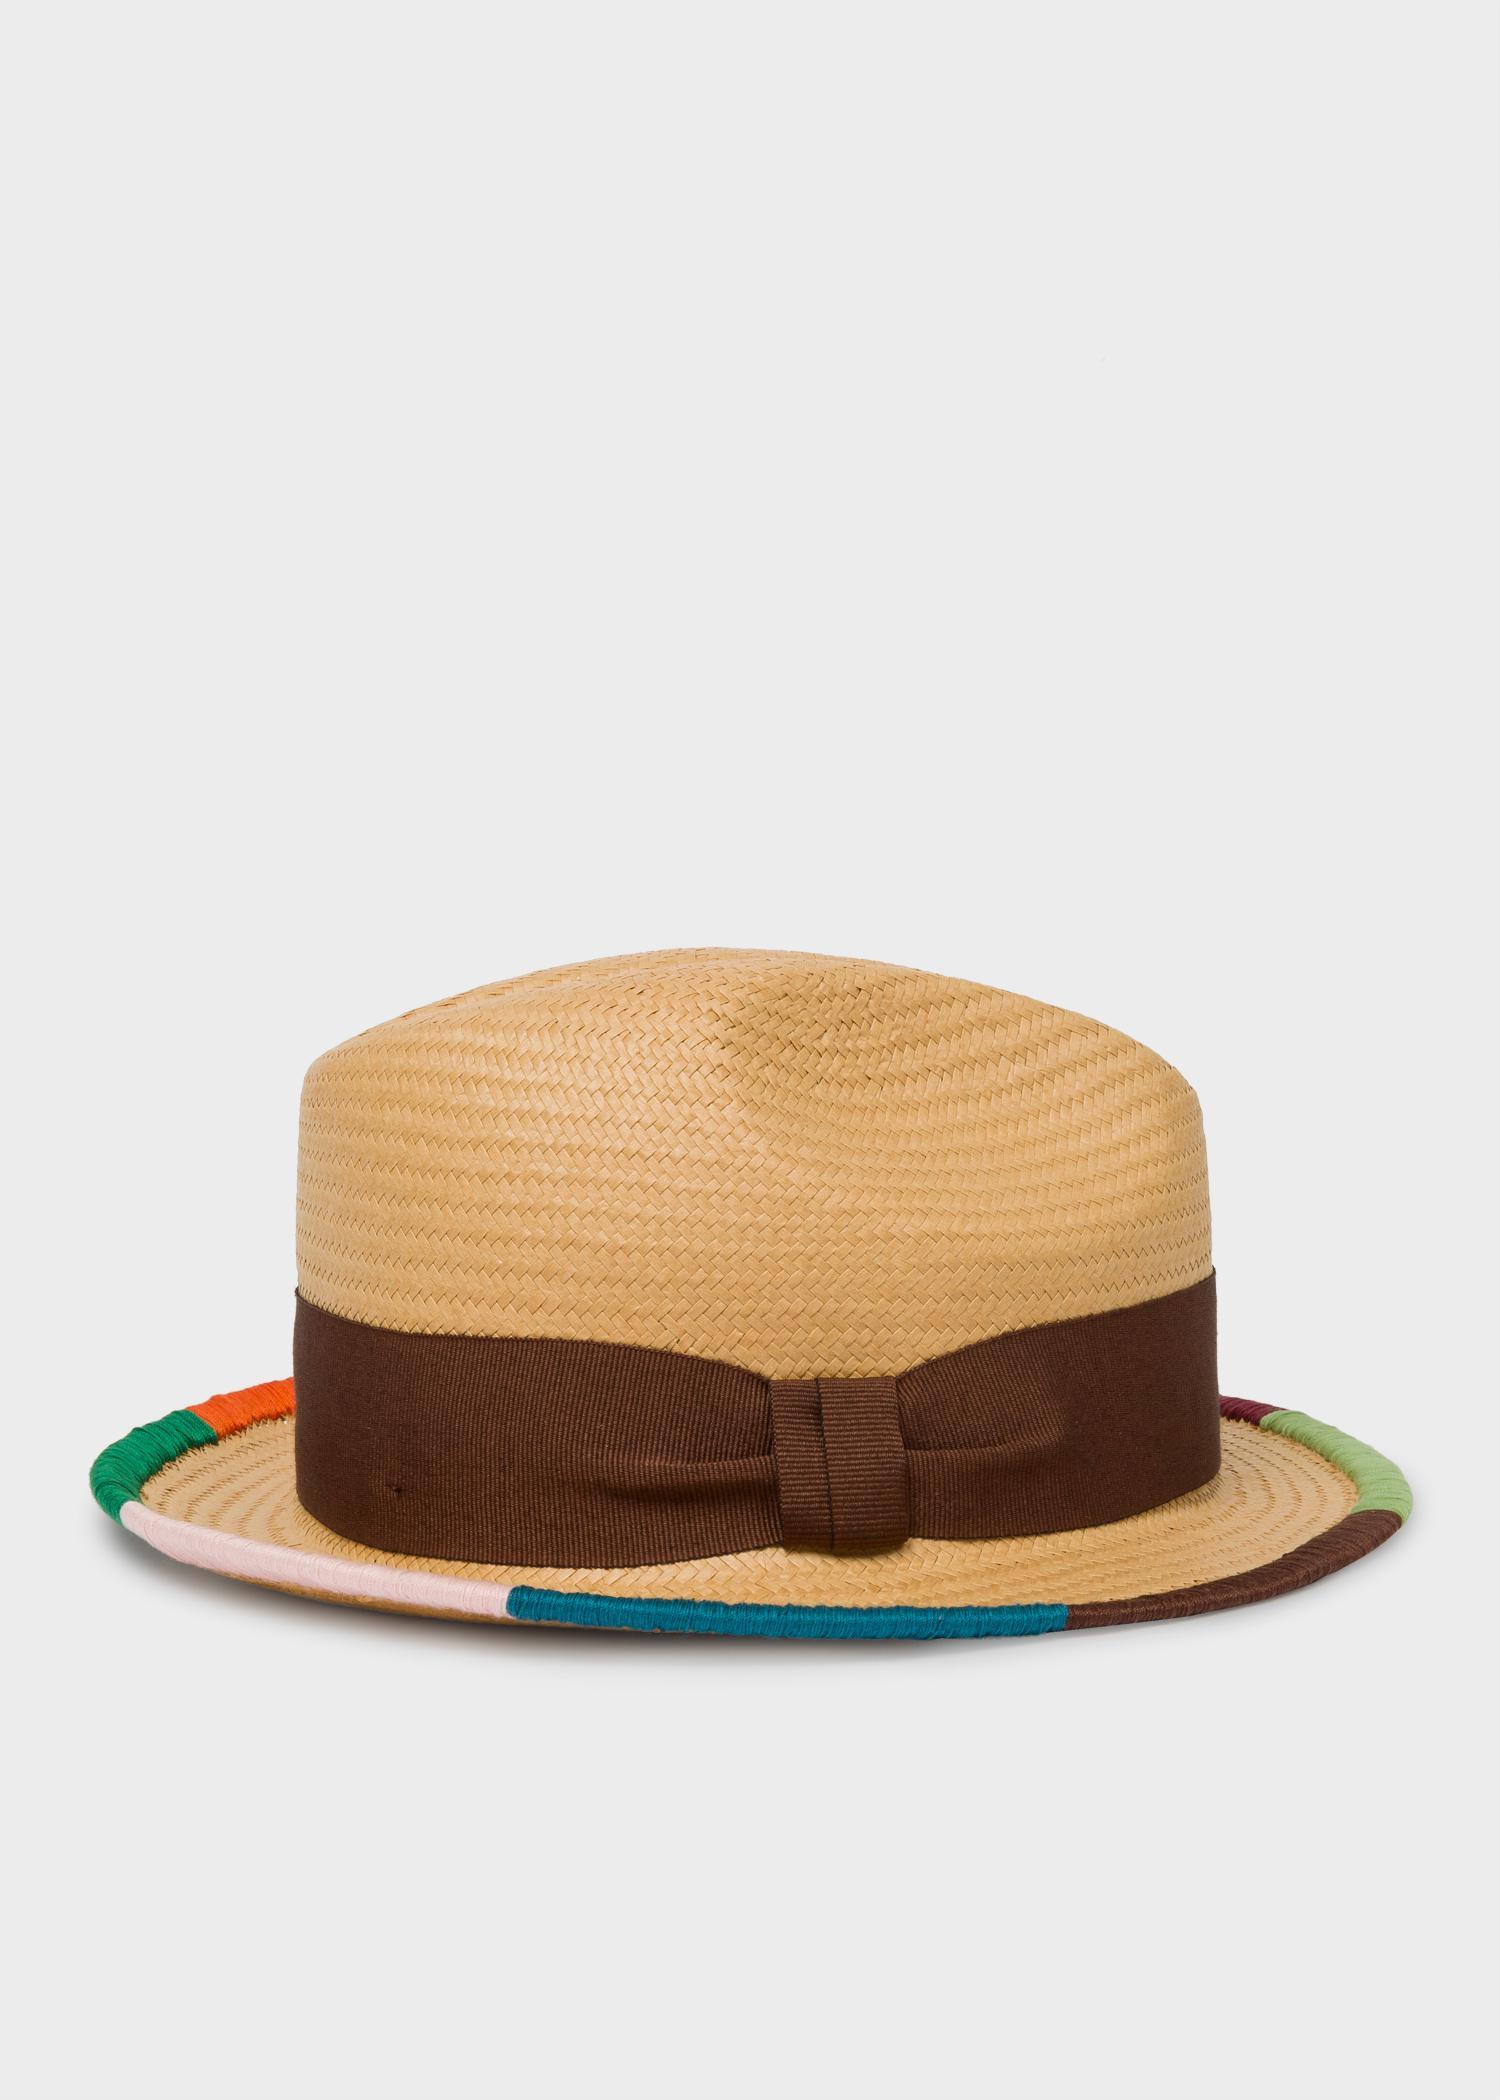 9da1dc7a157416 Paul Smith 'Artist Stripe' Border Plaited Hat for Men - Lyst